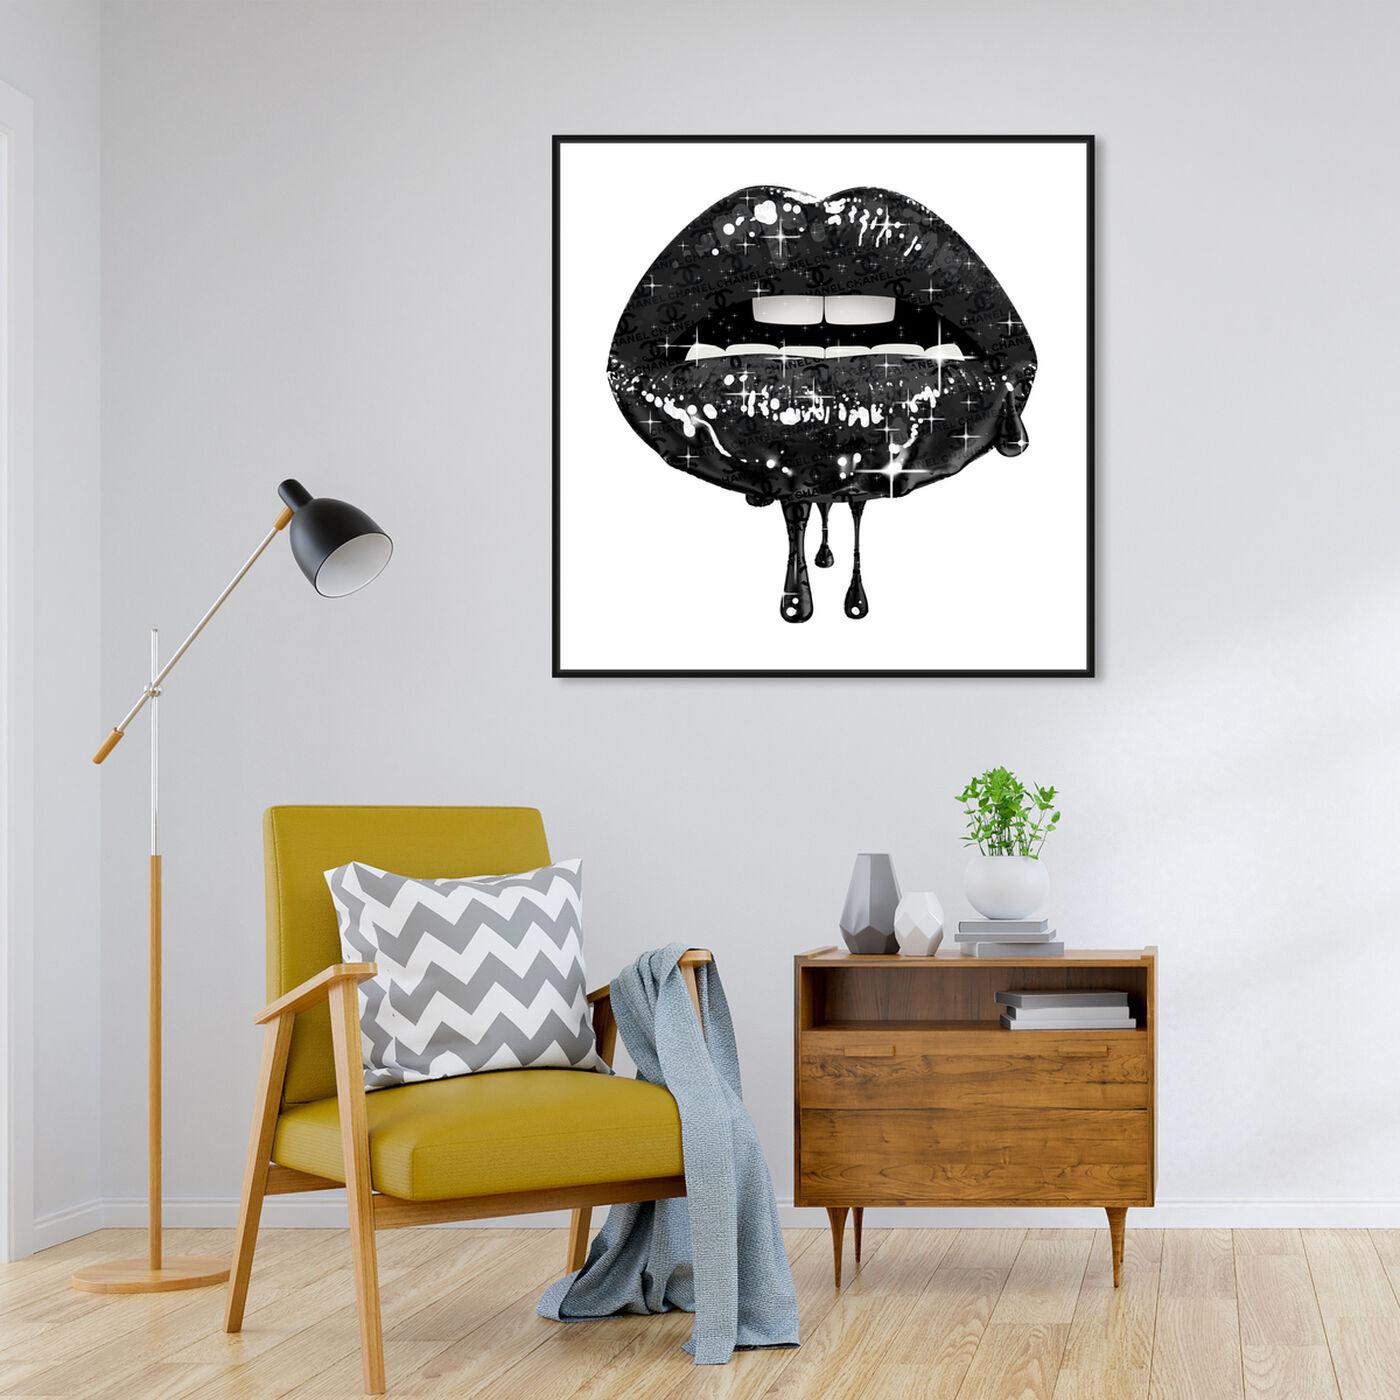 Hanging view of Noir Fashion Lips art.